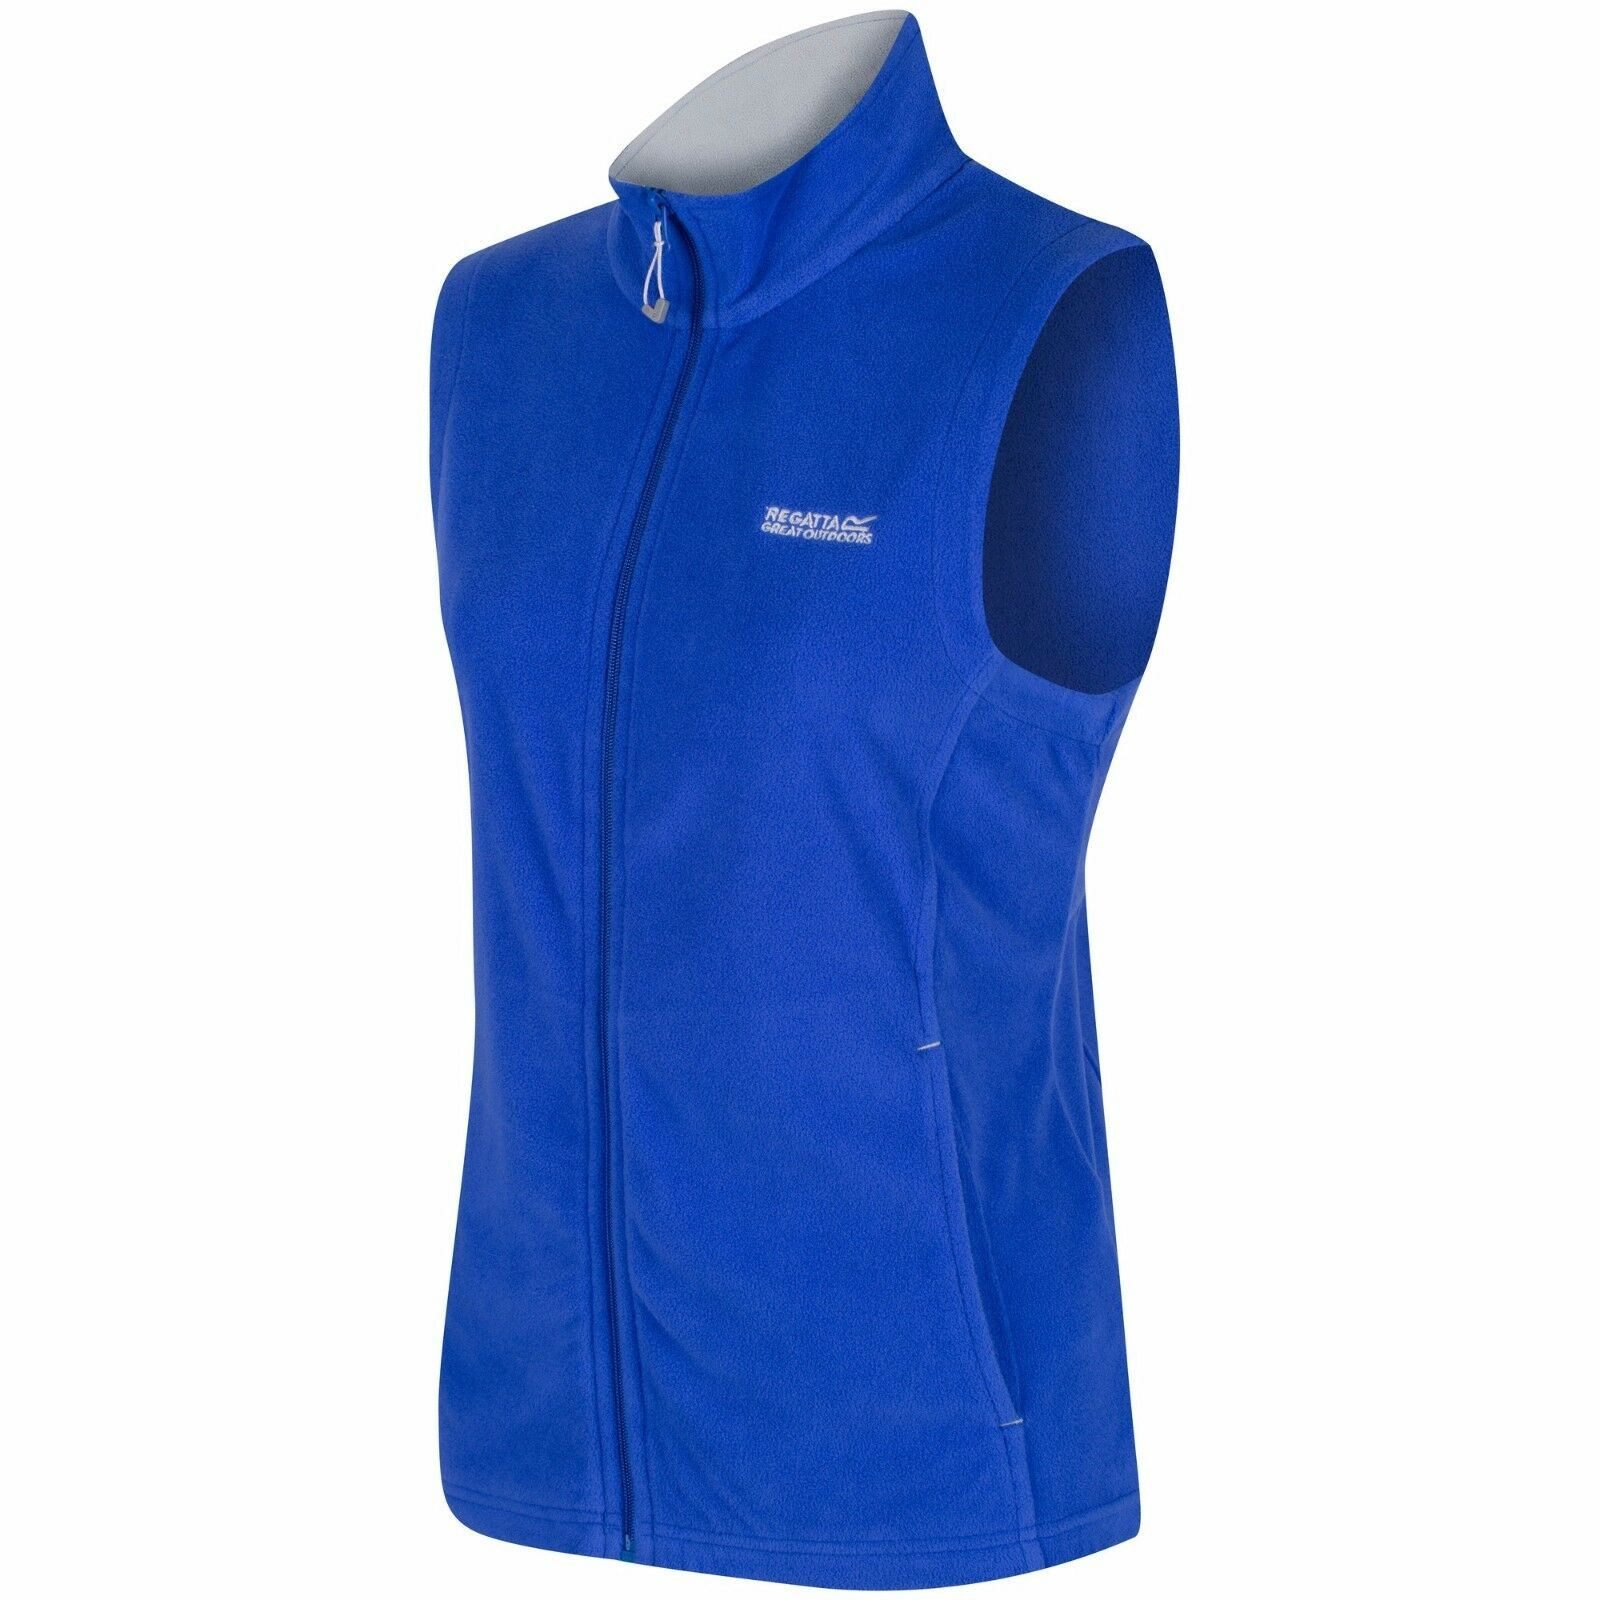 miniatuur 10 - Regatta Womens Sweetness Full Zip Micro Fleece Casual Bodywarmer Waistcoat